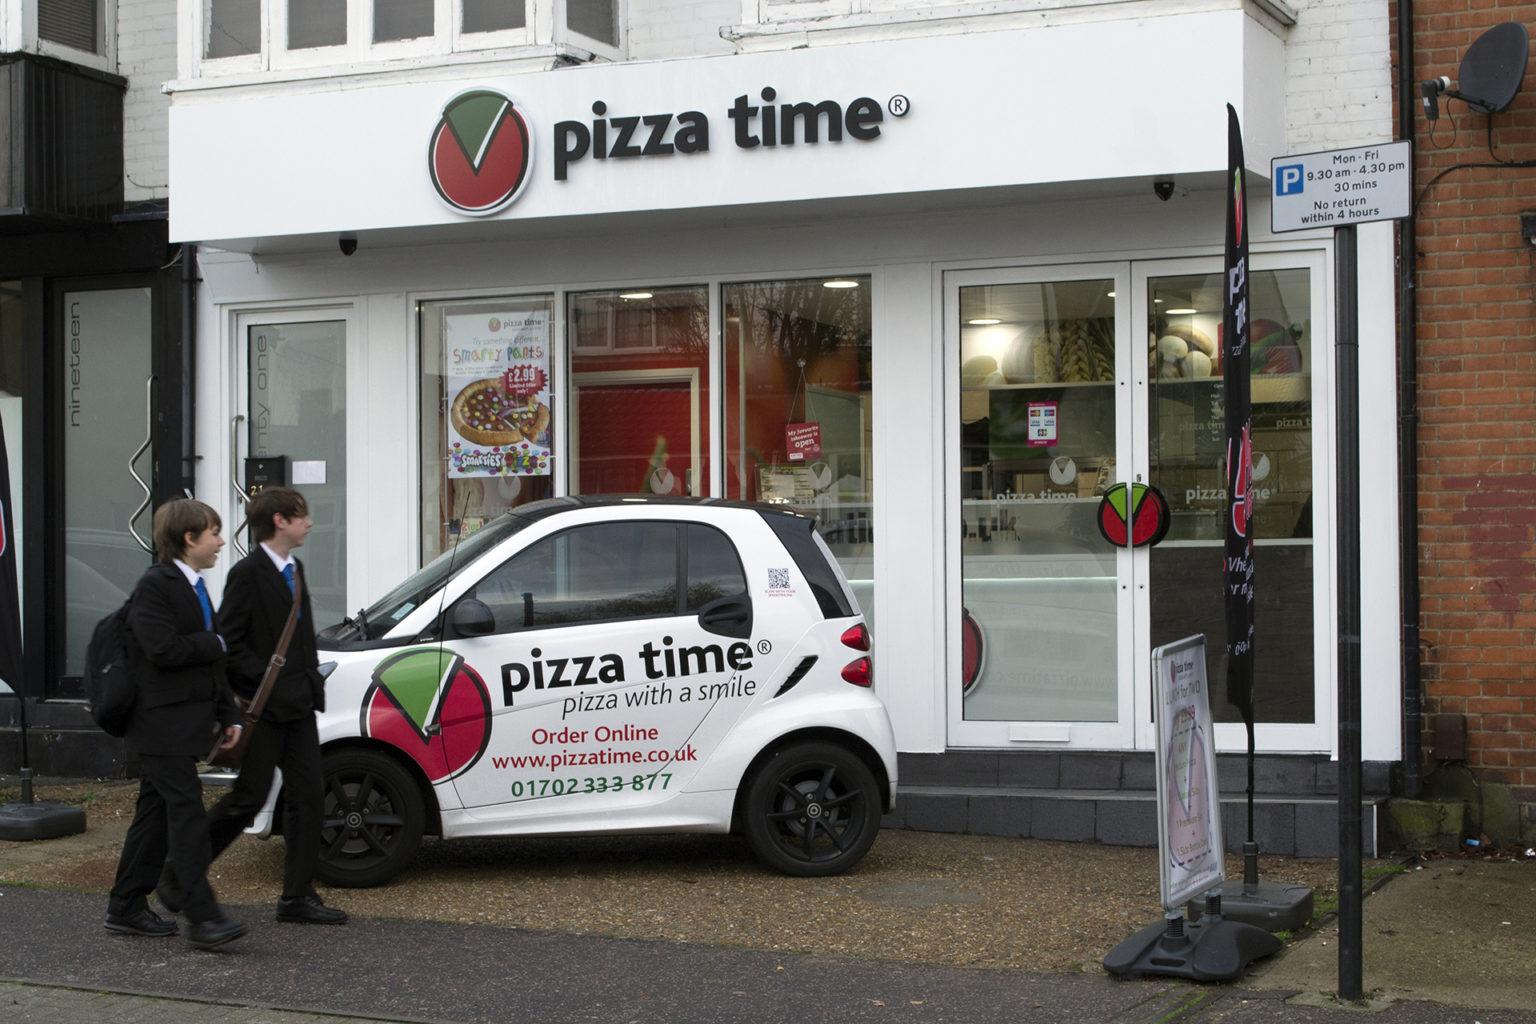 Pizza Time Southend - 01